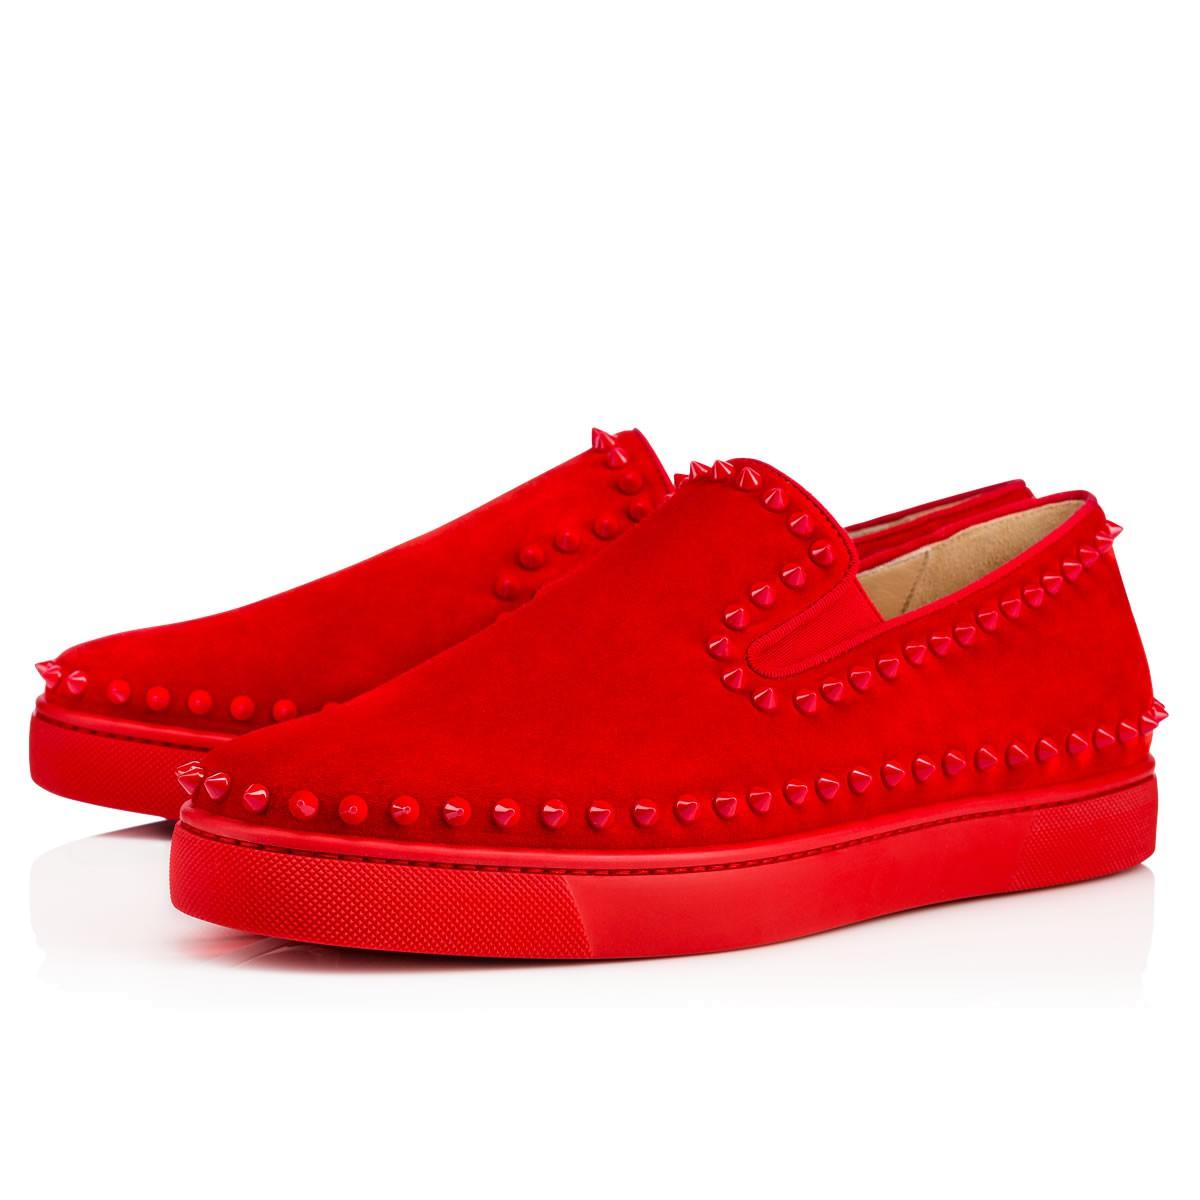 Retail Men's shoes Christian Louboutin pik boat men s flat Pavot 1130280R102 Flagship Store